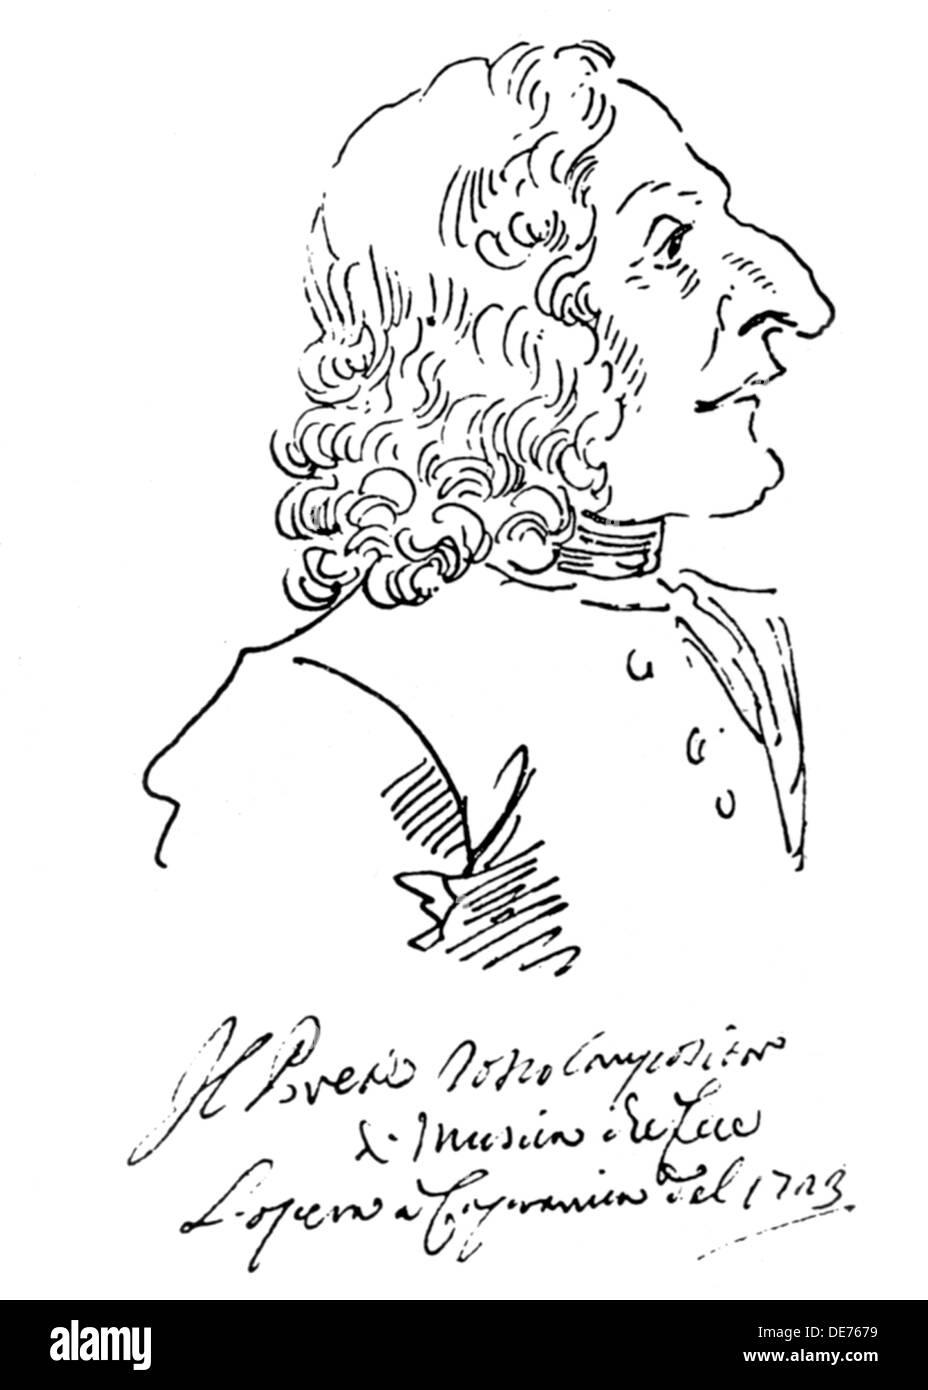 Caricature of composer Antonio Vivaldi, 1723. Artist: Ghezzi, Pier Leone (1674-1755) - Stock Image